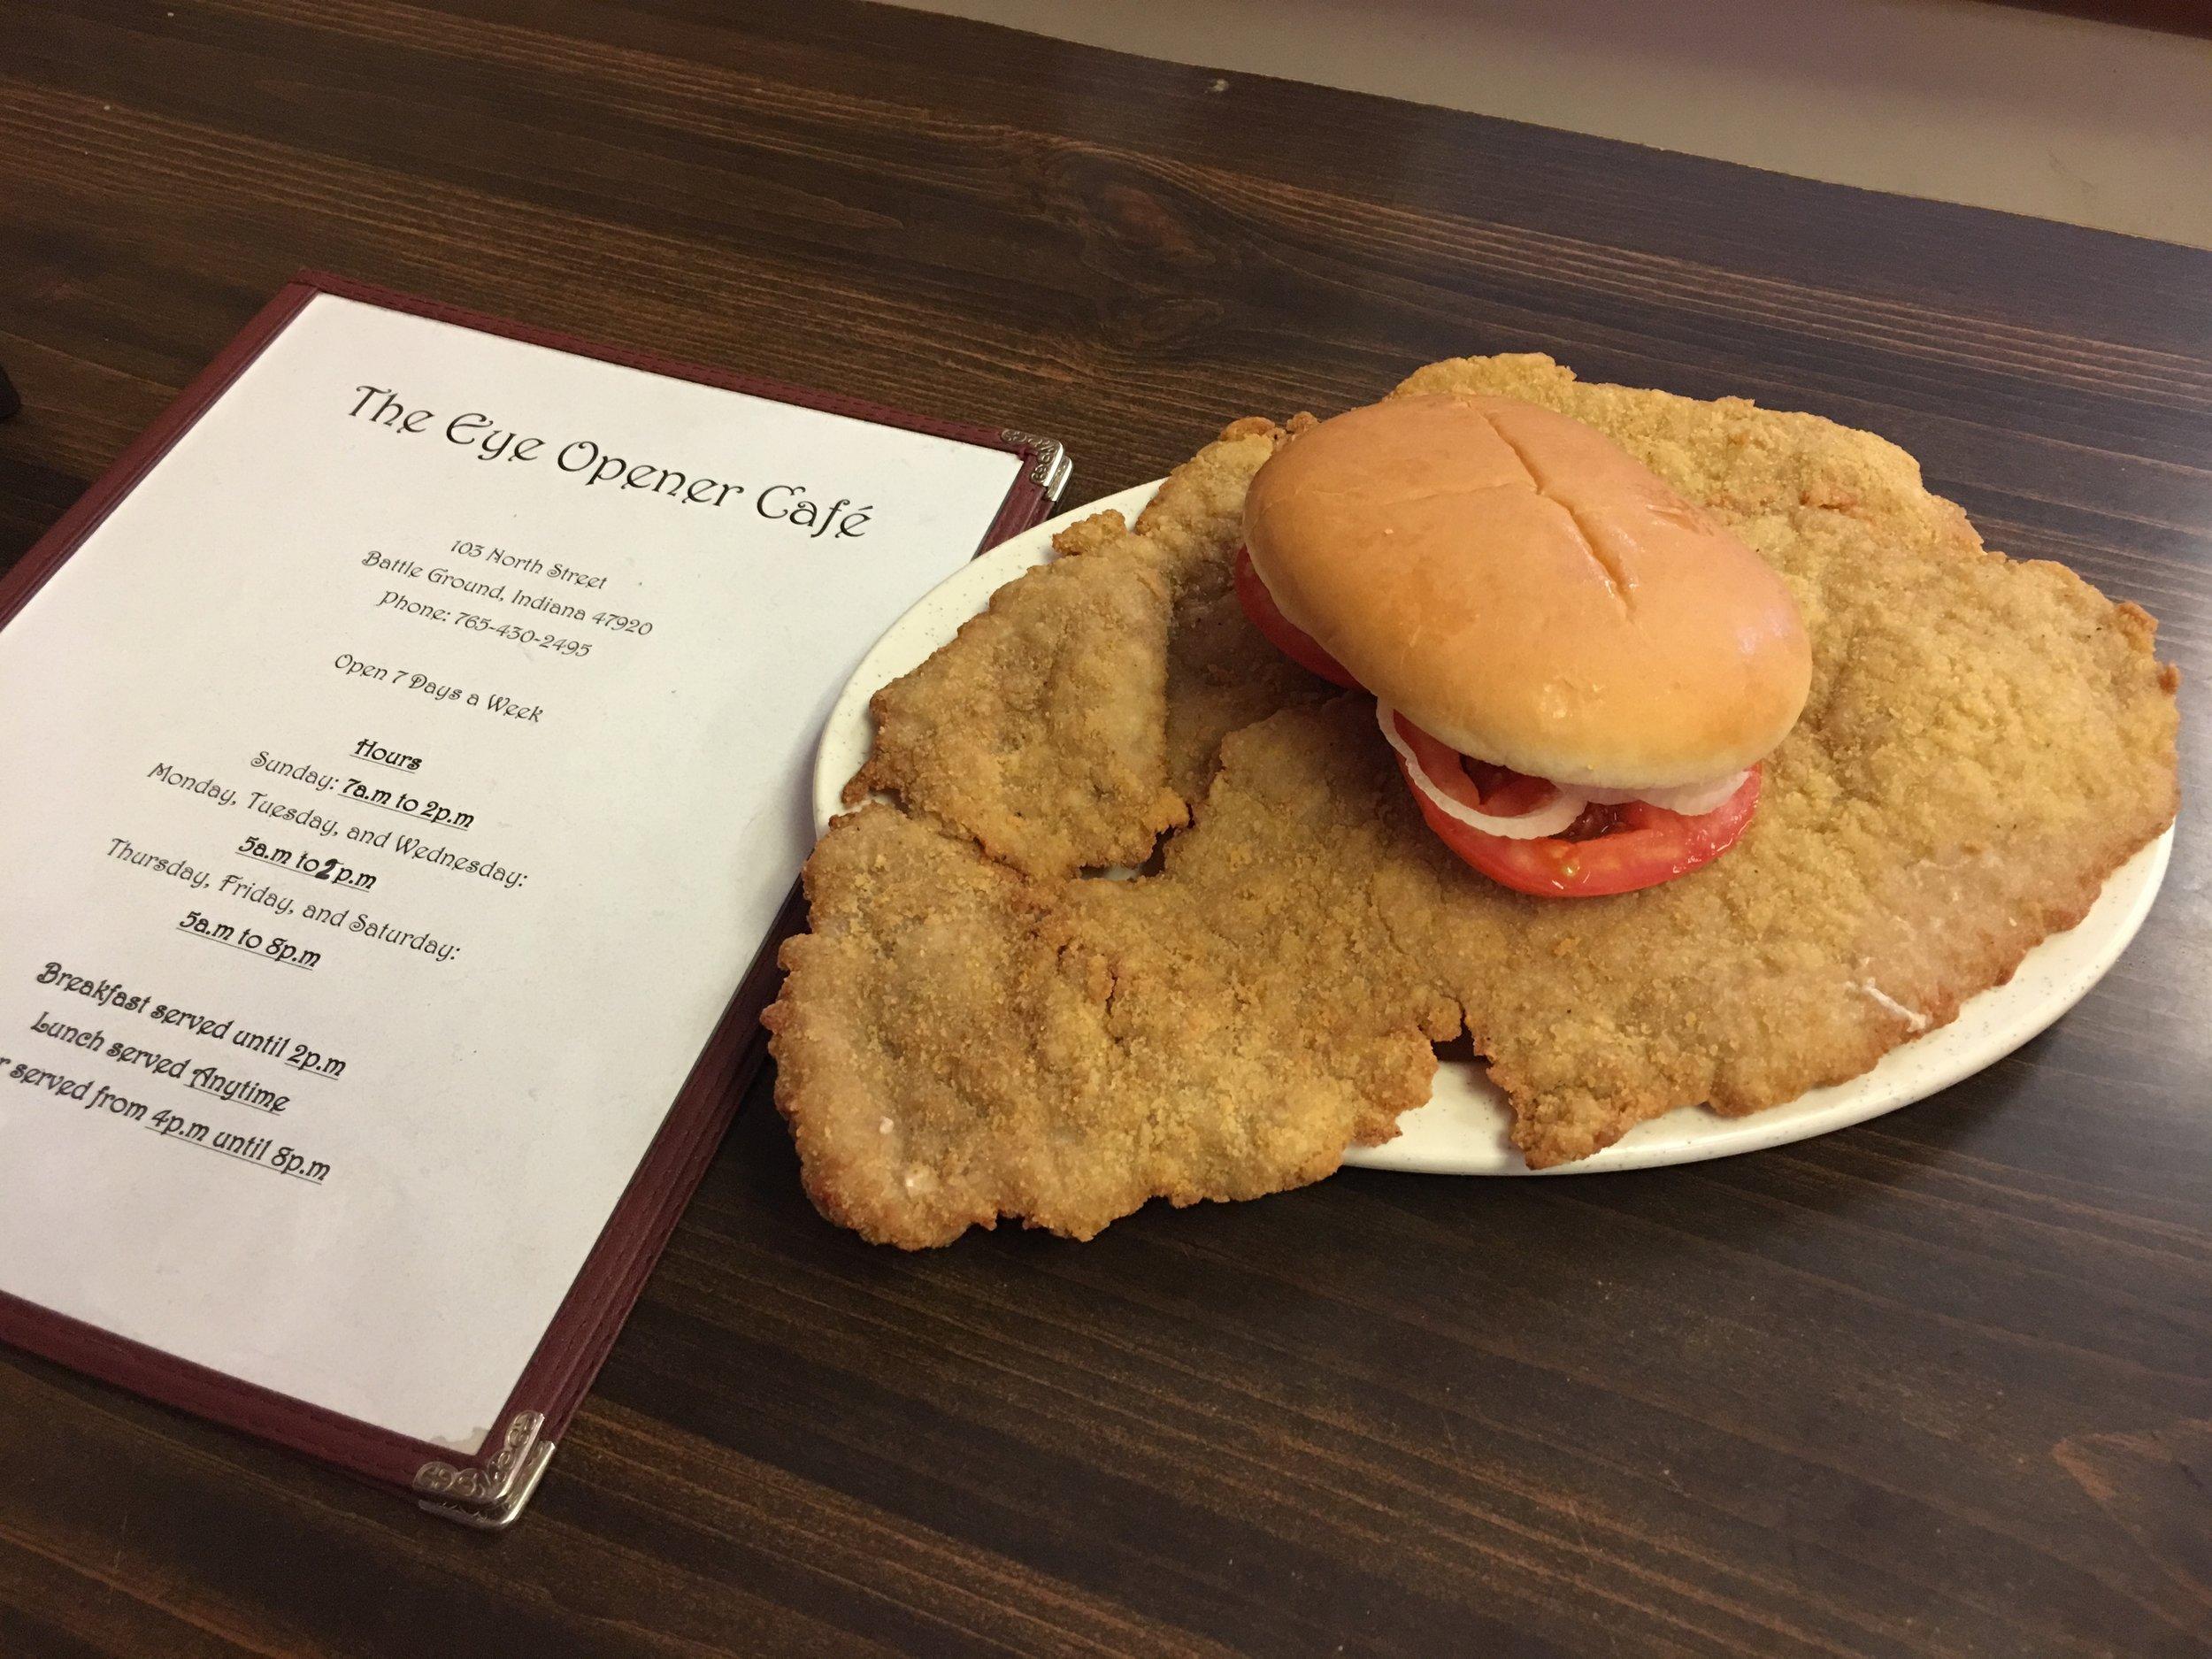 The Indiana Breaded Pork Sandwich